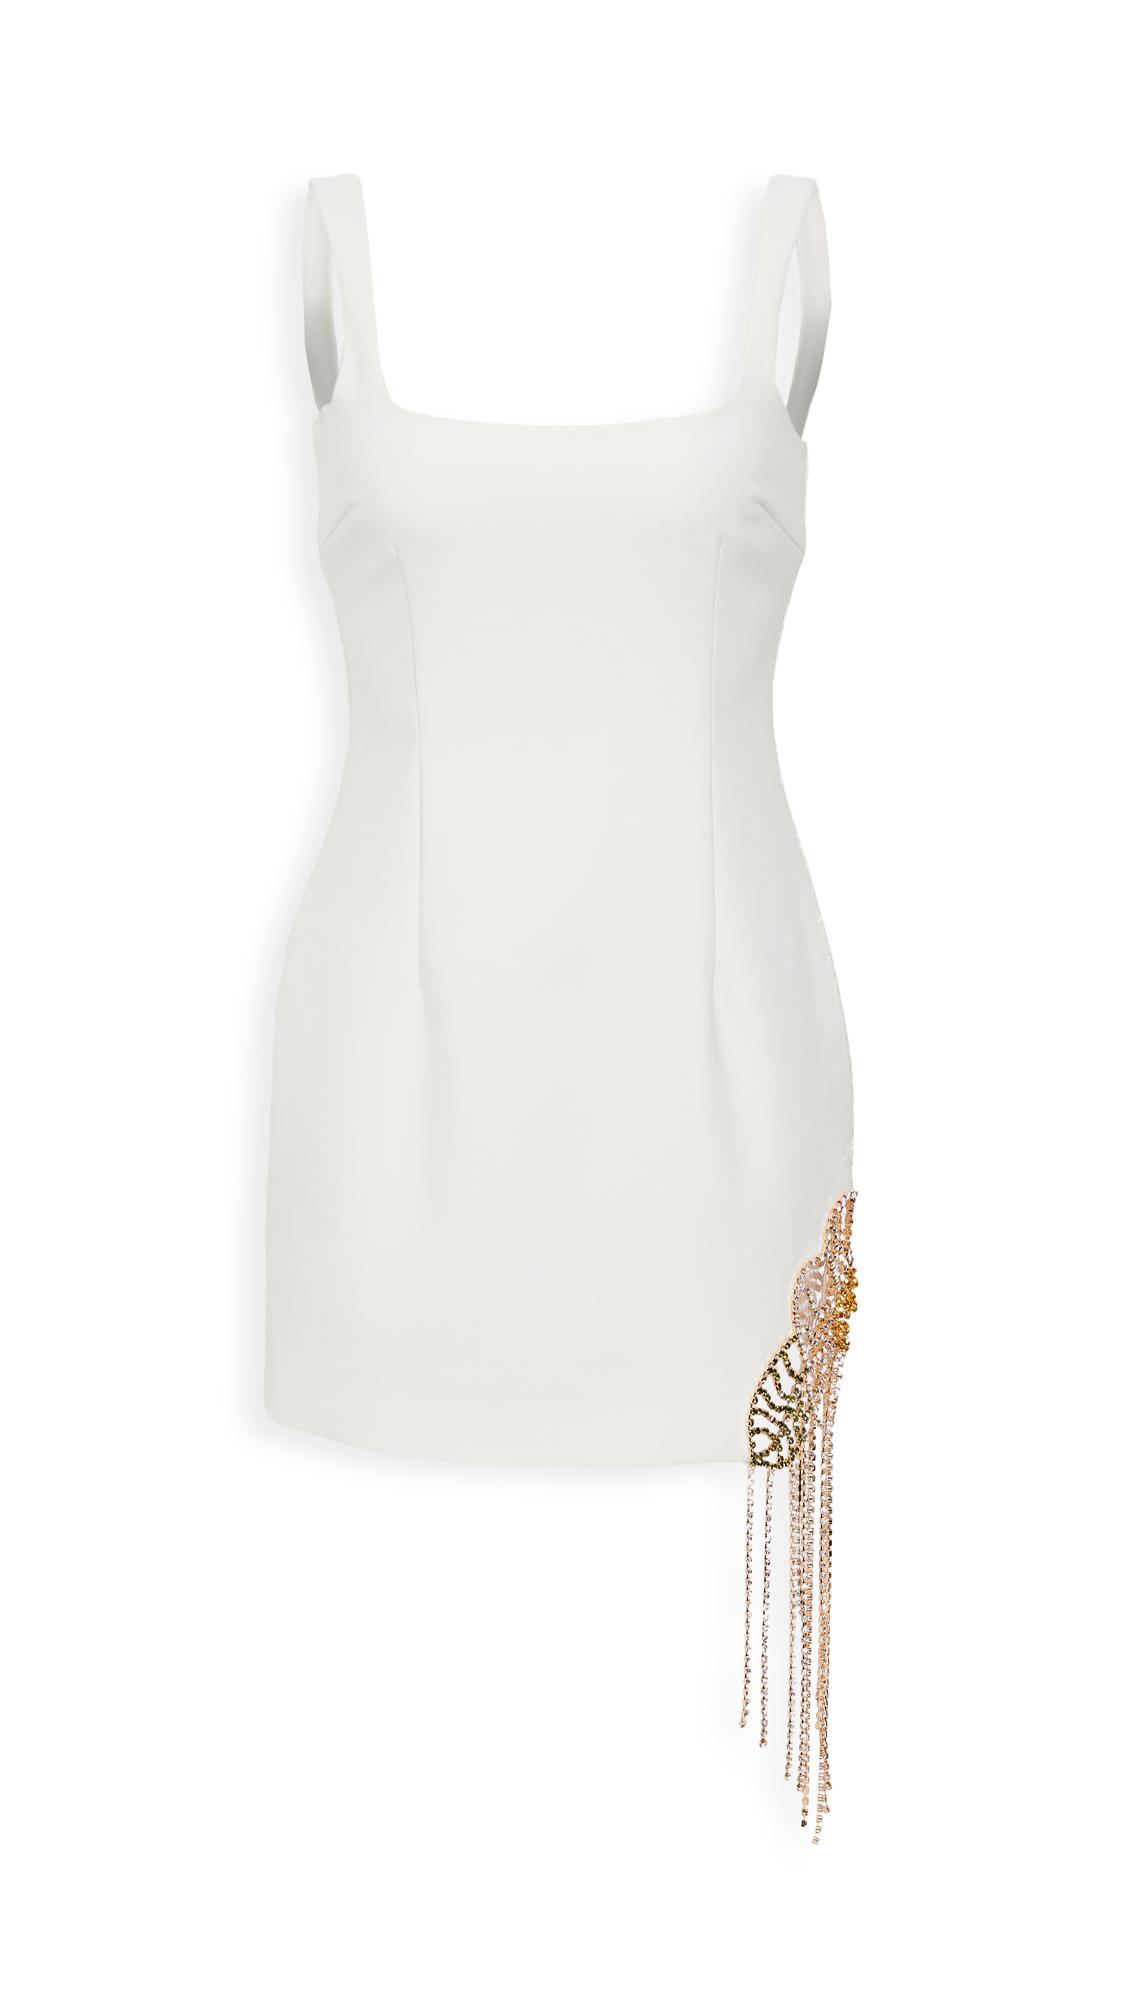 Area Crystal Flower Cutout Dress - 30% Off Sale